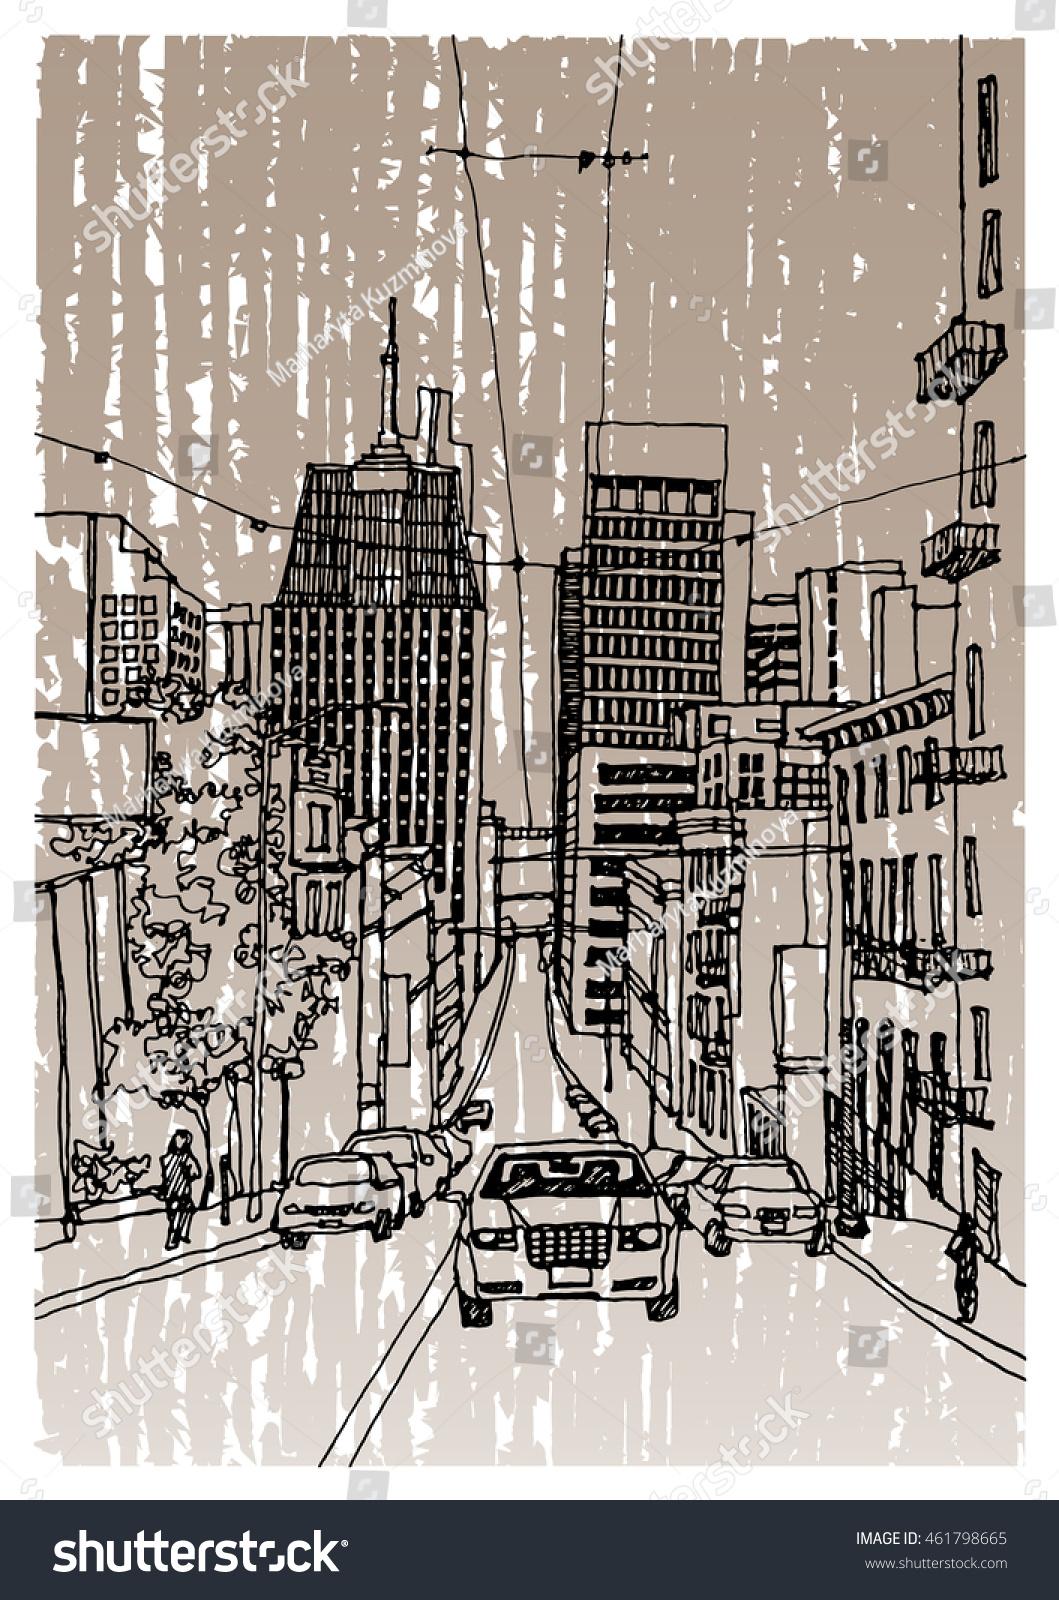 Scene Street Illustration Hand Drawn Ink Stock Vector 461798665 ...